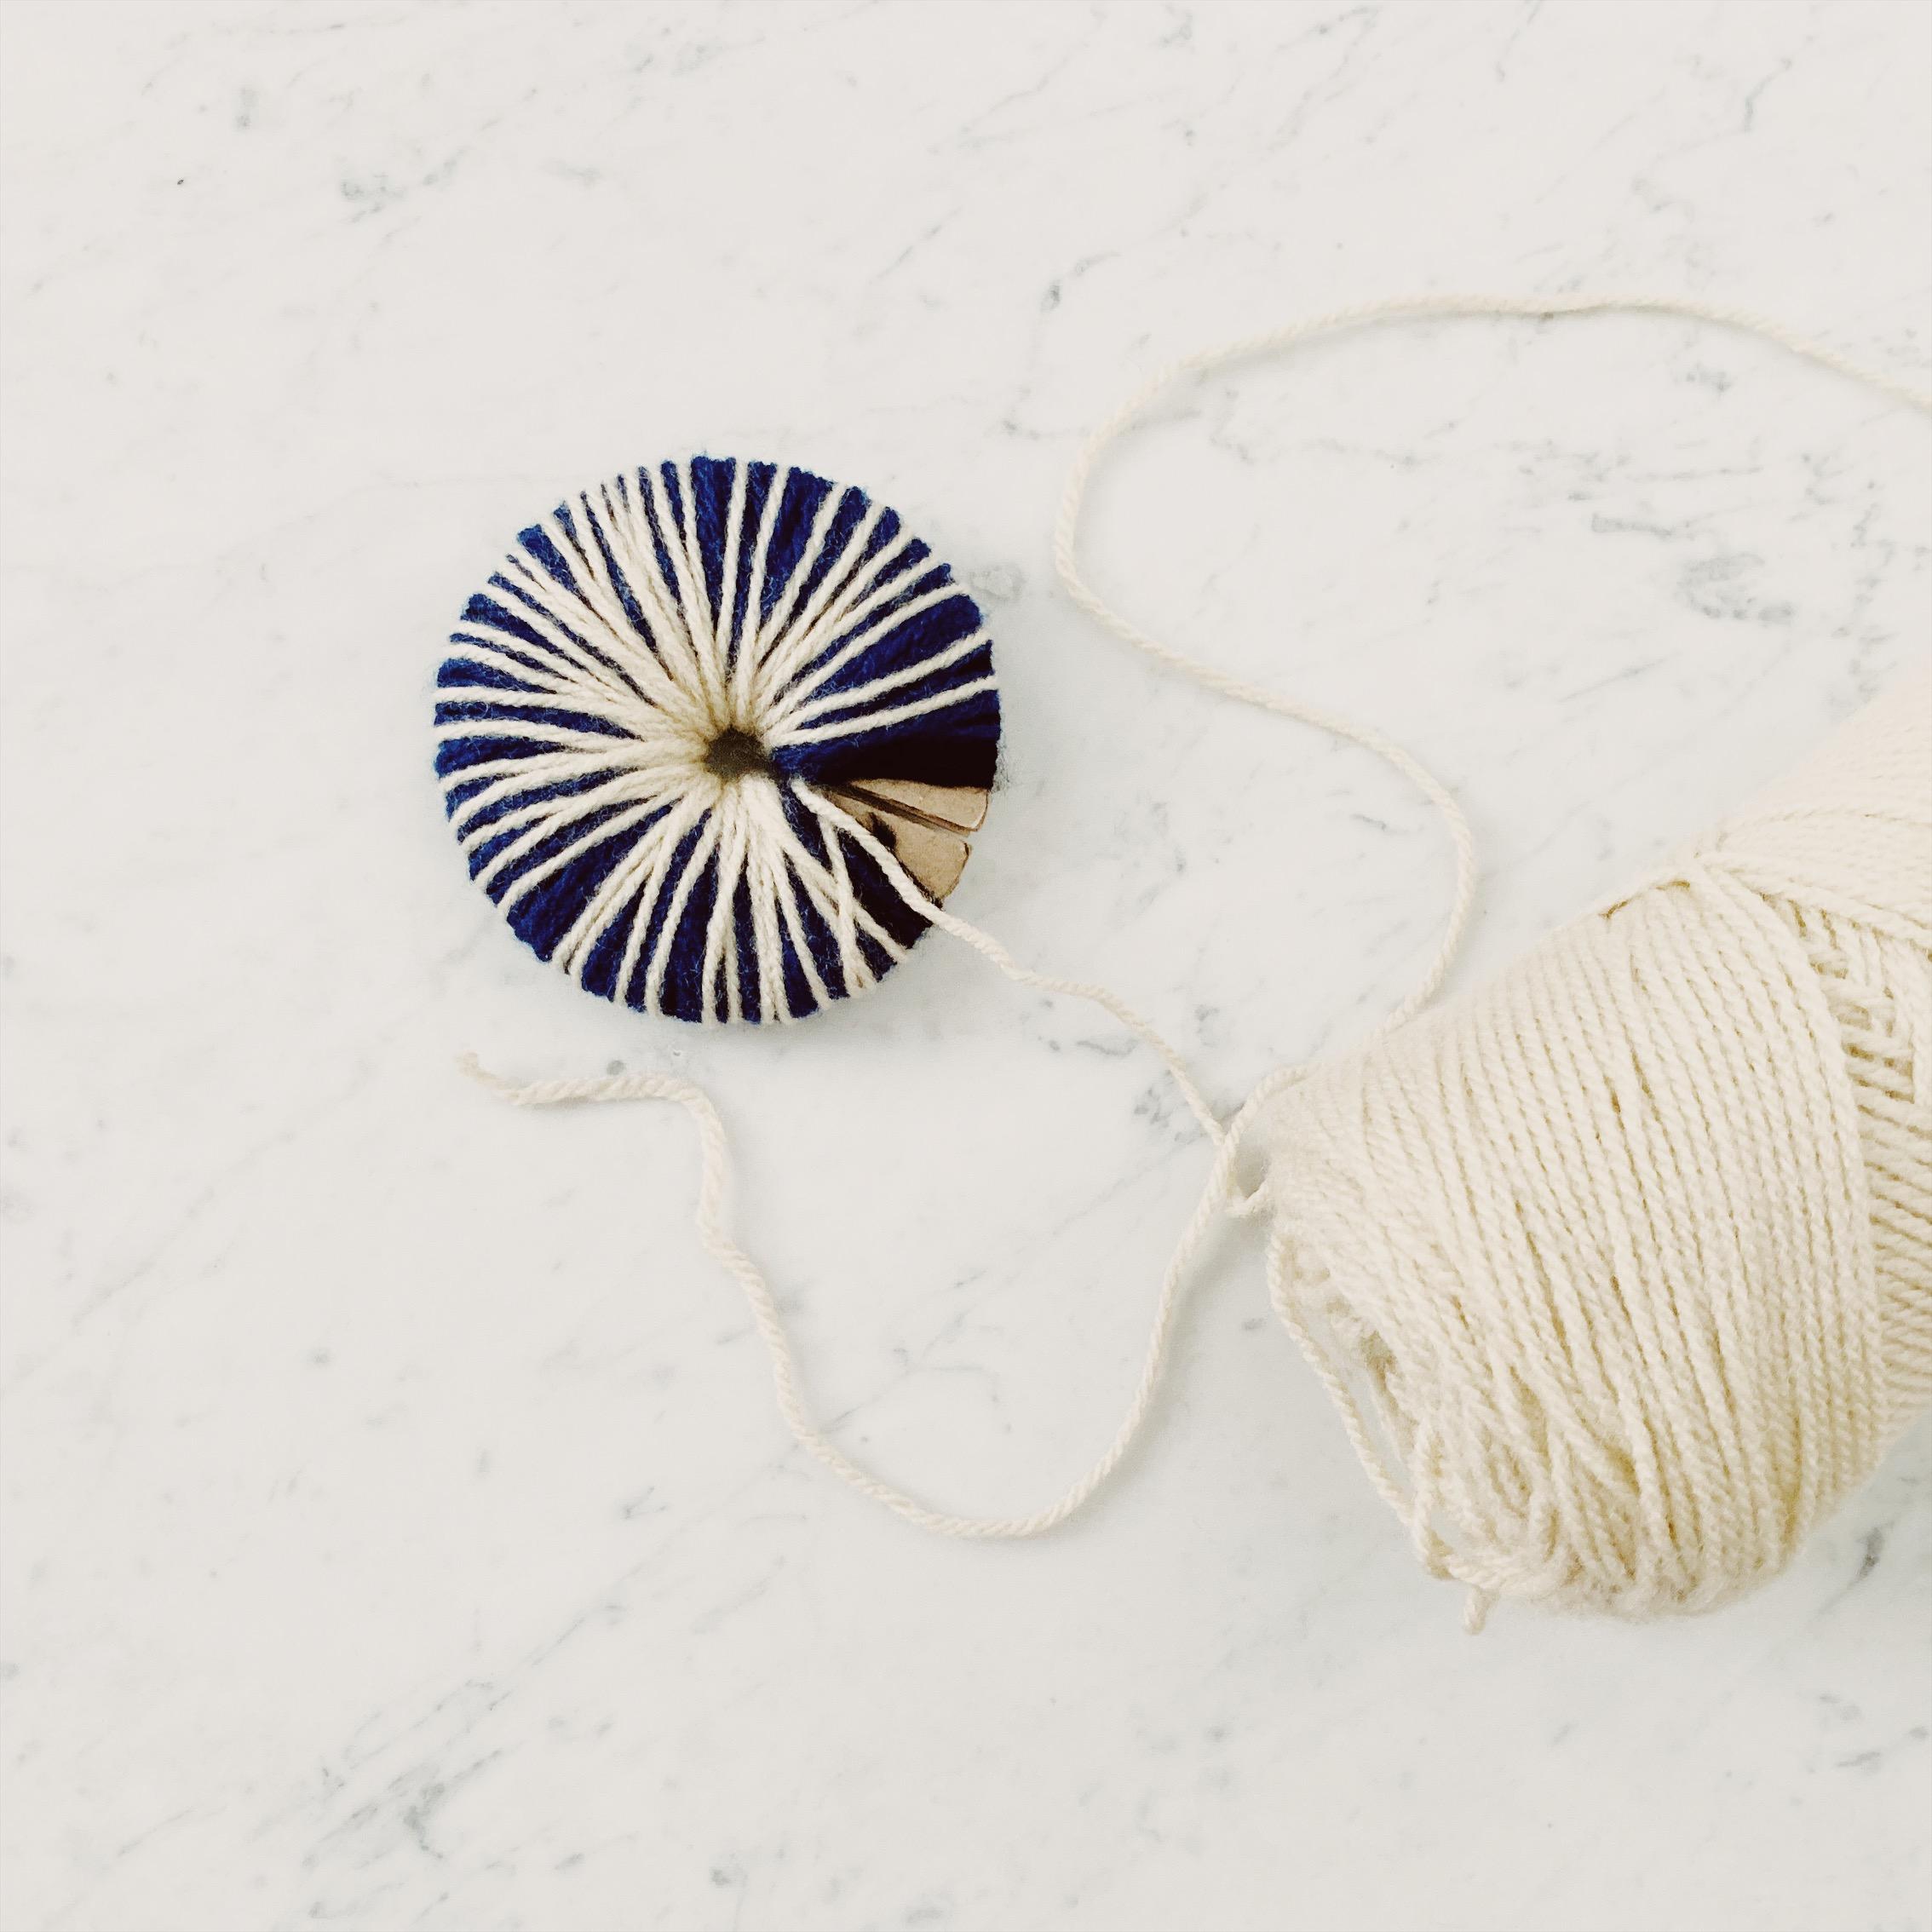 2. Wrap yarn around the cardboard ring -